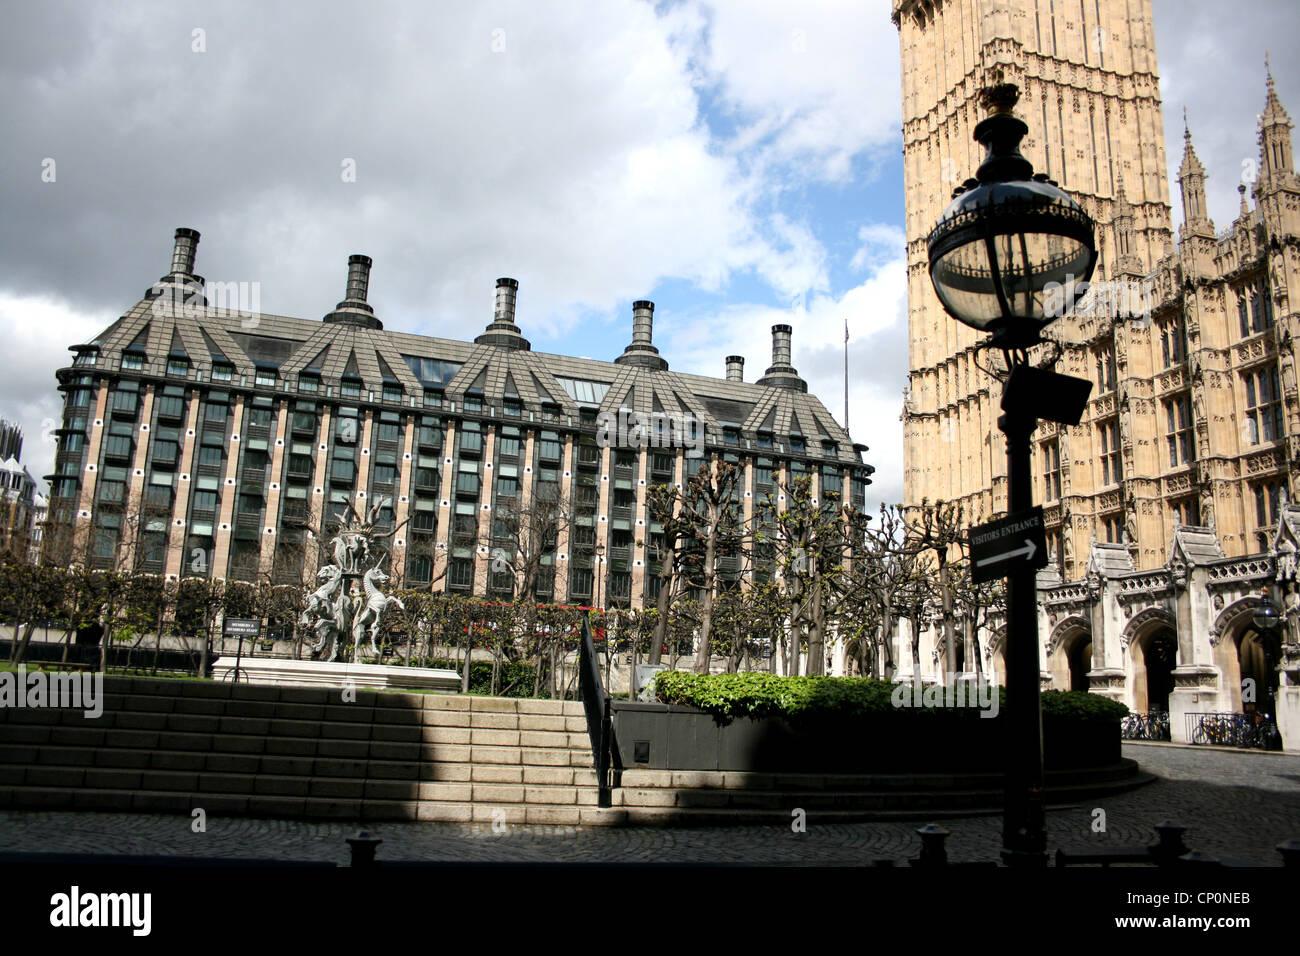 portcullis house and big ben westminster london uk 2012 Stock Photo